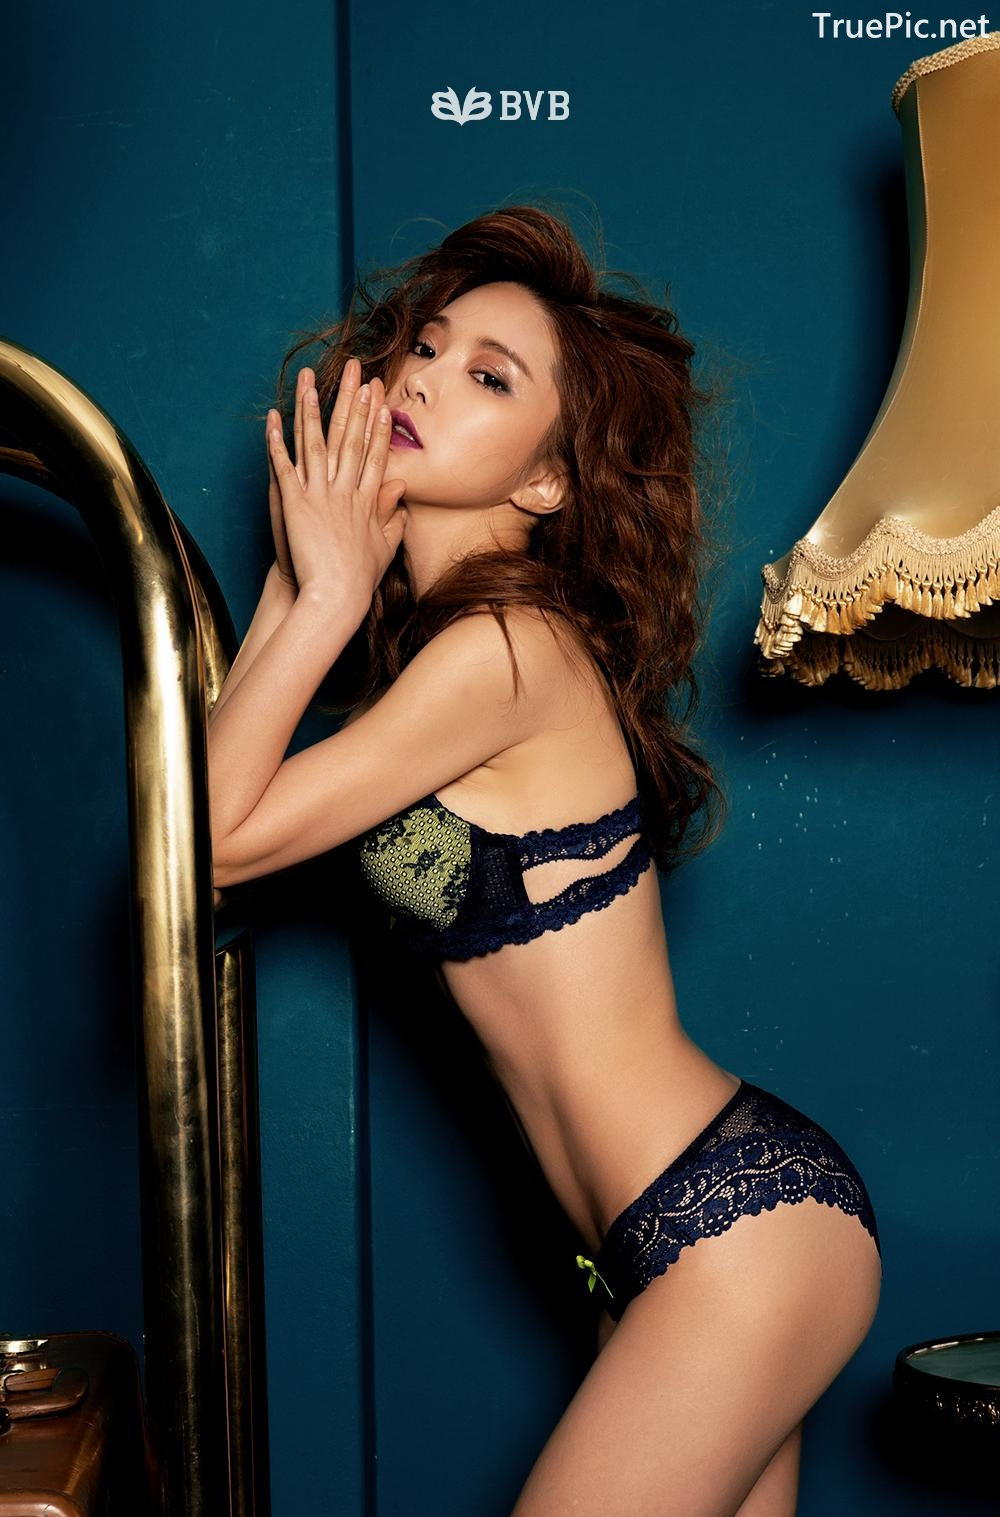 Image Korean Fashion Model - Park Soo Yeon - BVB Black Lace Lingerie - TruePic.net - Picture-5